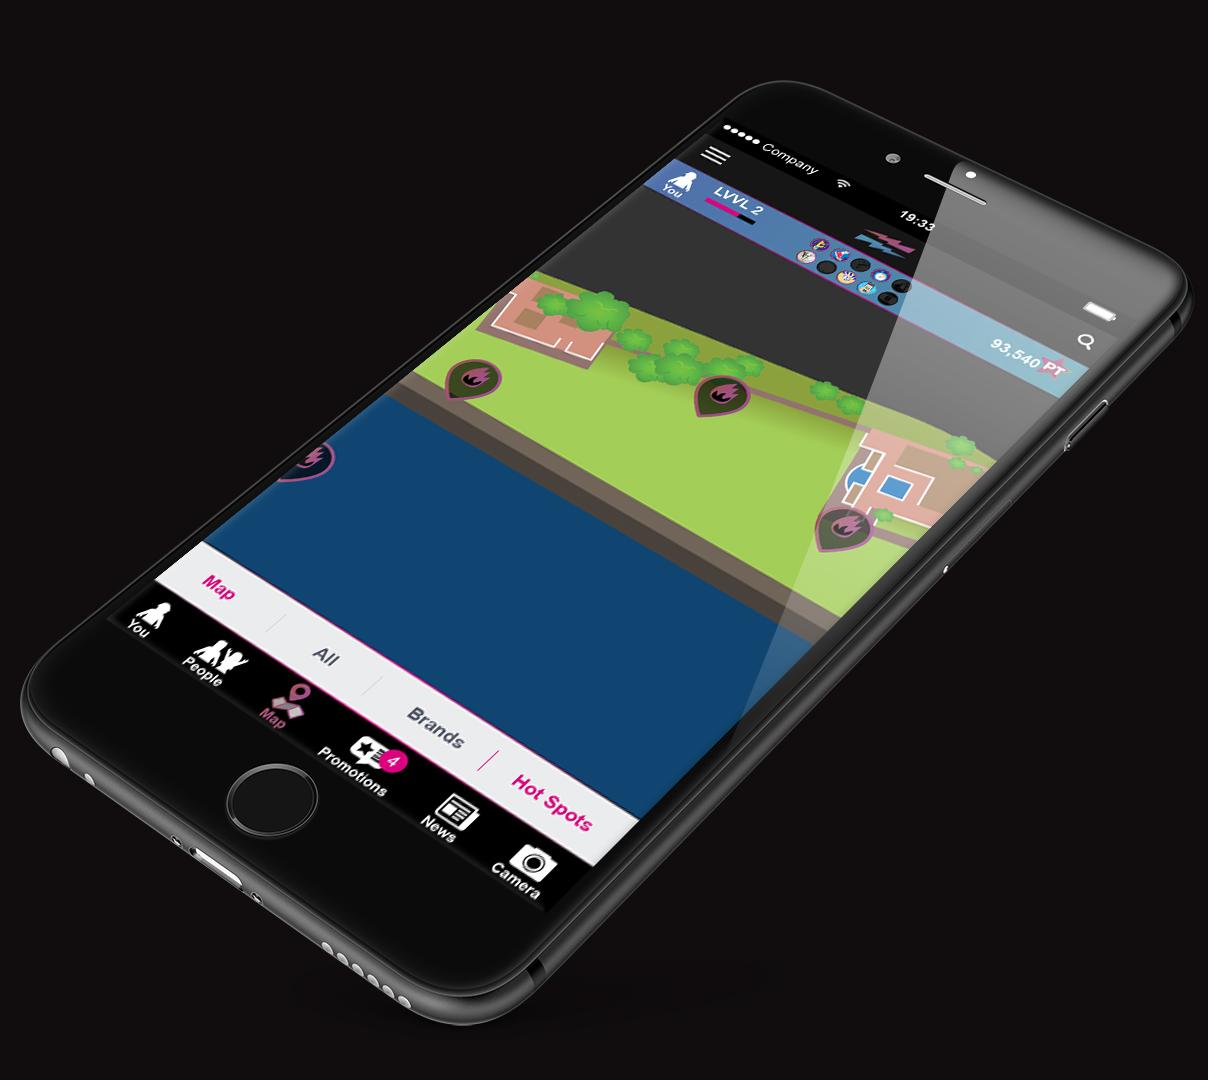 LEVVEL iPhone_Plus_app_map hotspots.jpg